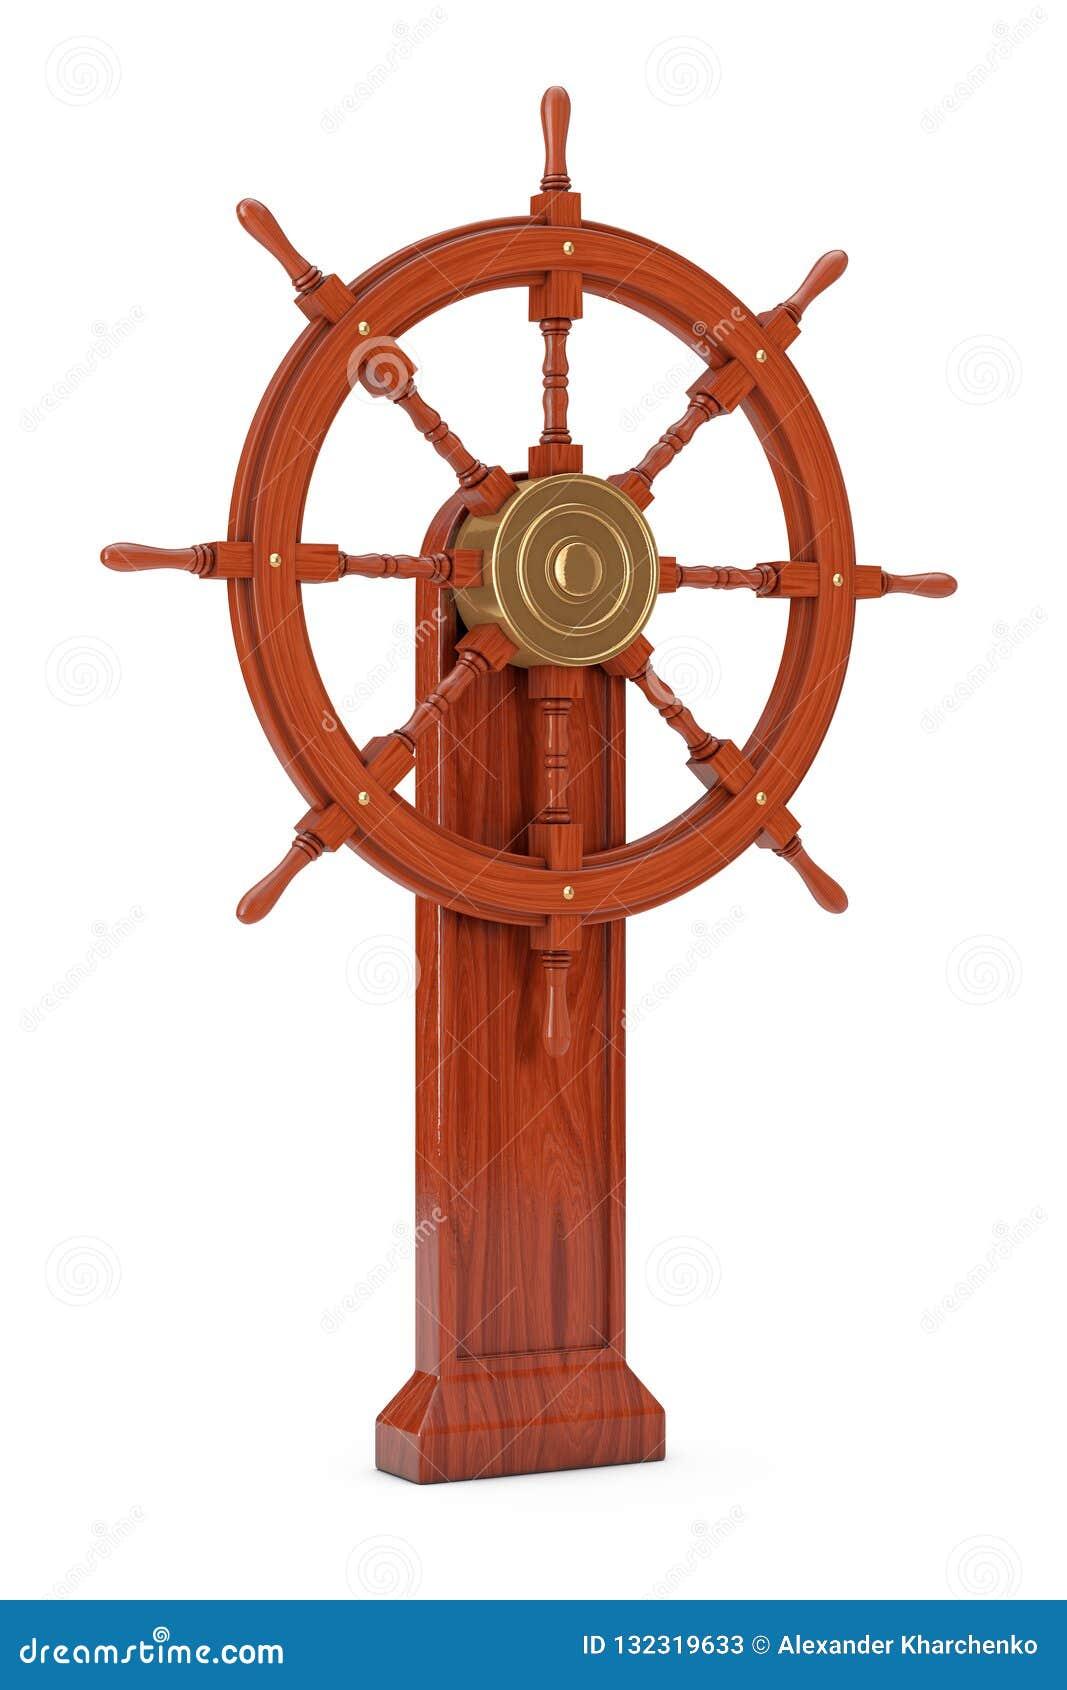 Vintage Wooden Ship Steering Wheel With Stand 3d Rendering Stock Illustration Illustration Of Nostalgia Antique 132319633